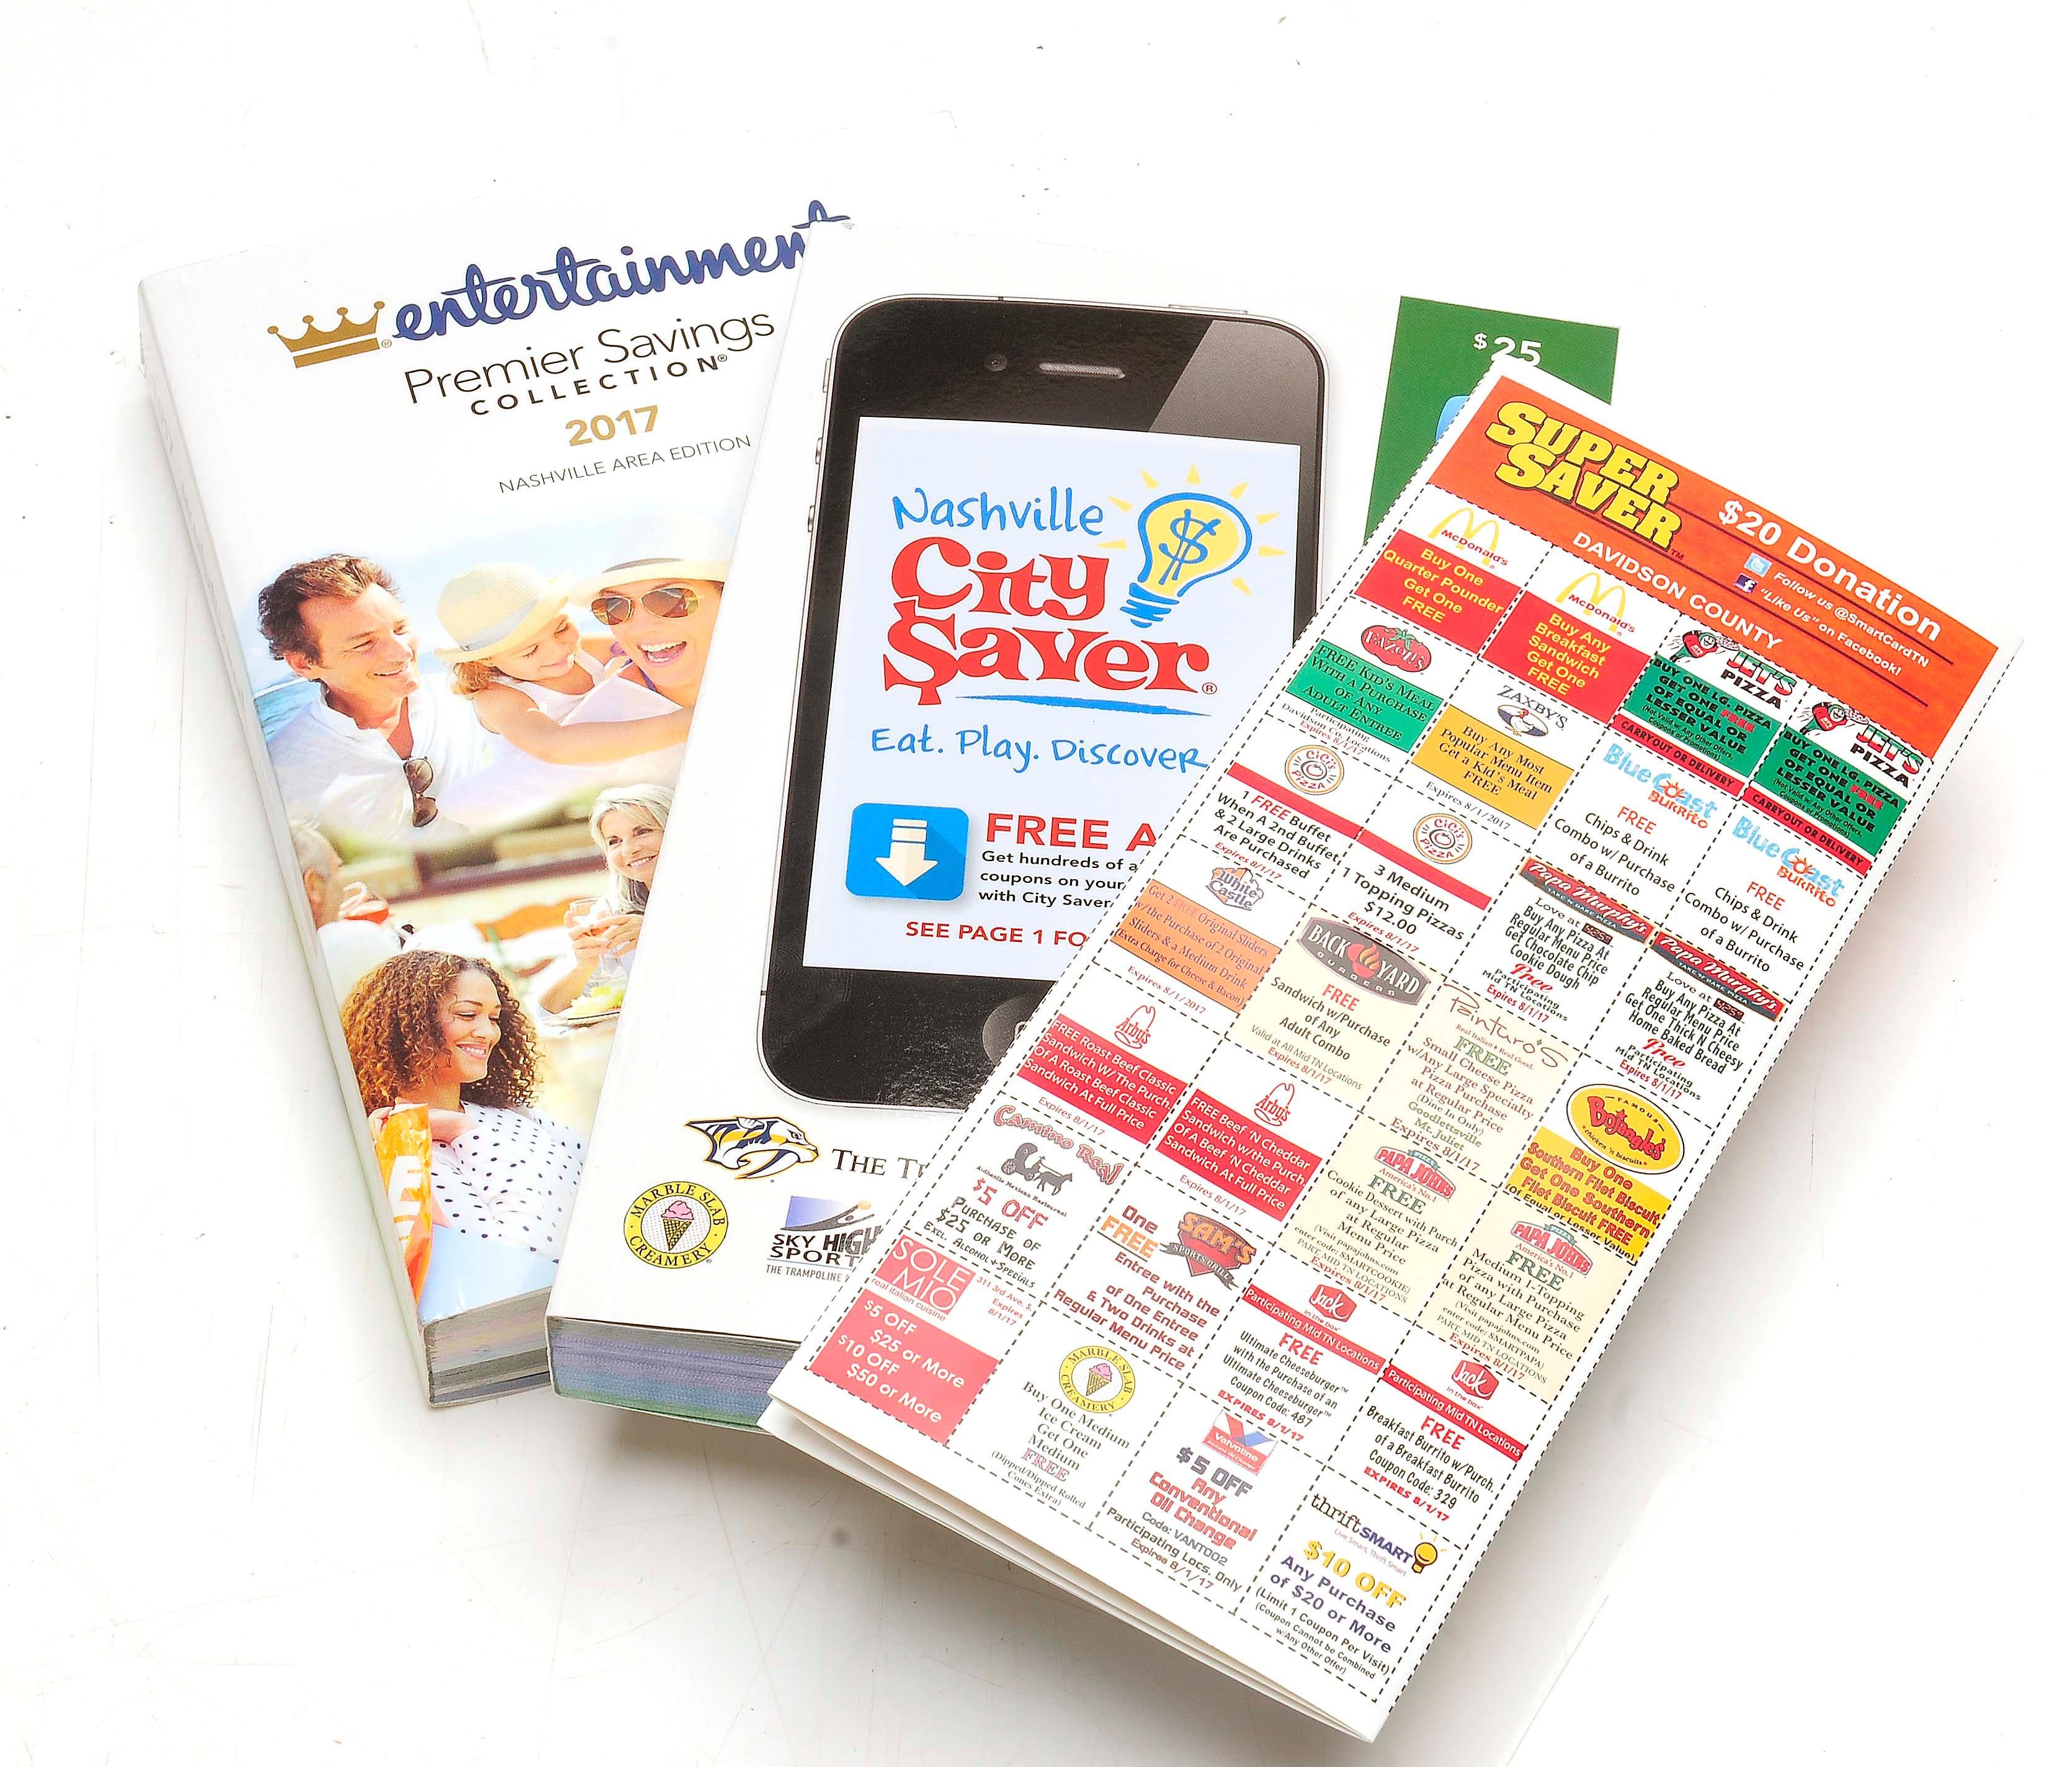 ellendales restaurant coupons